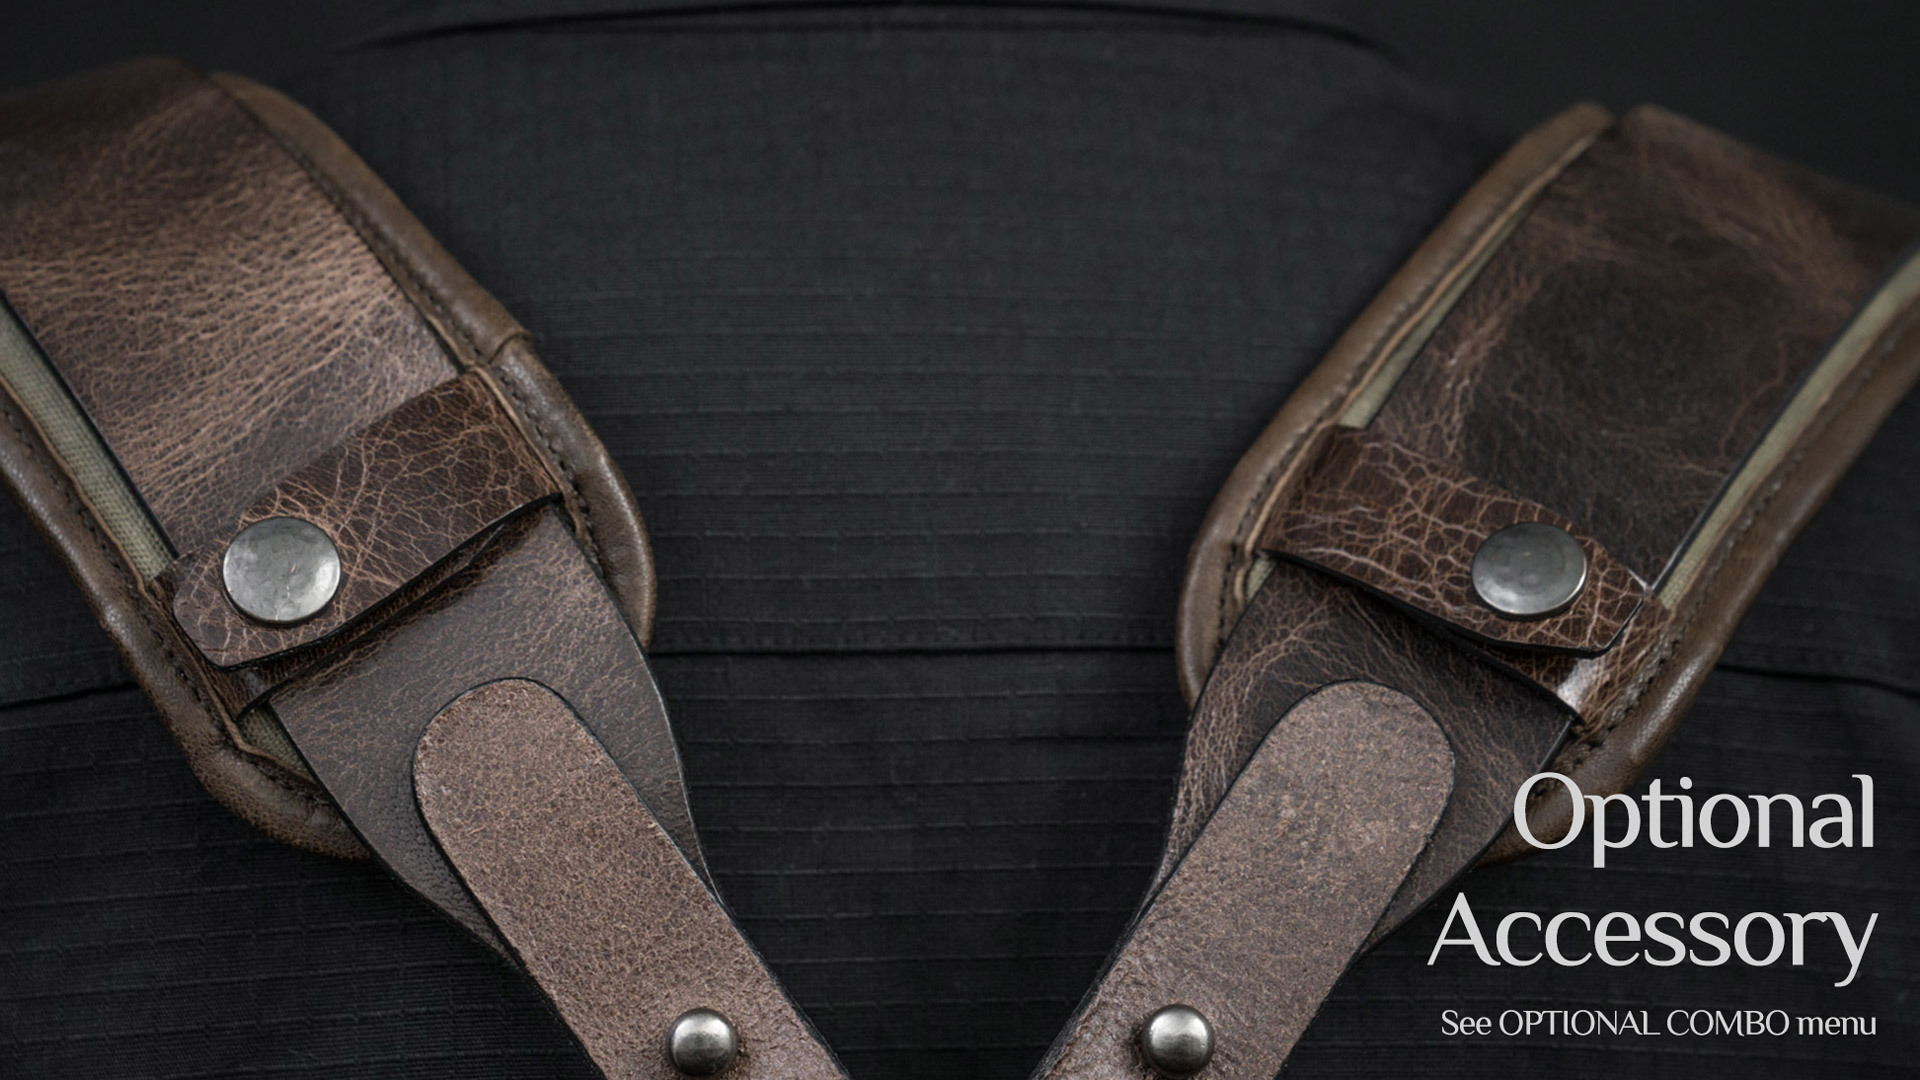 Optional accessory shoulder pads.